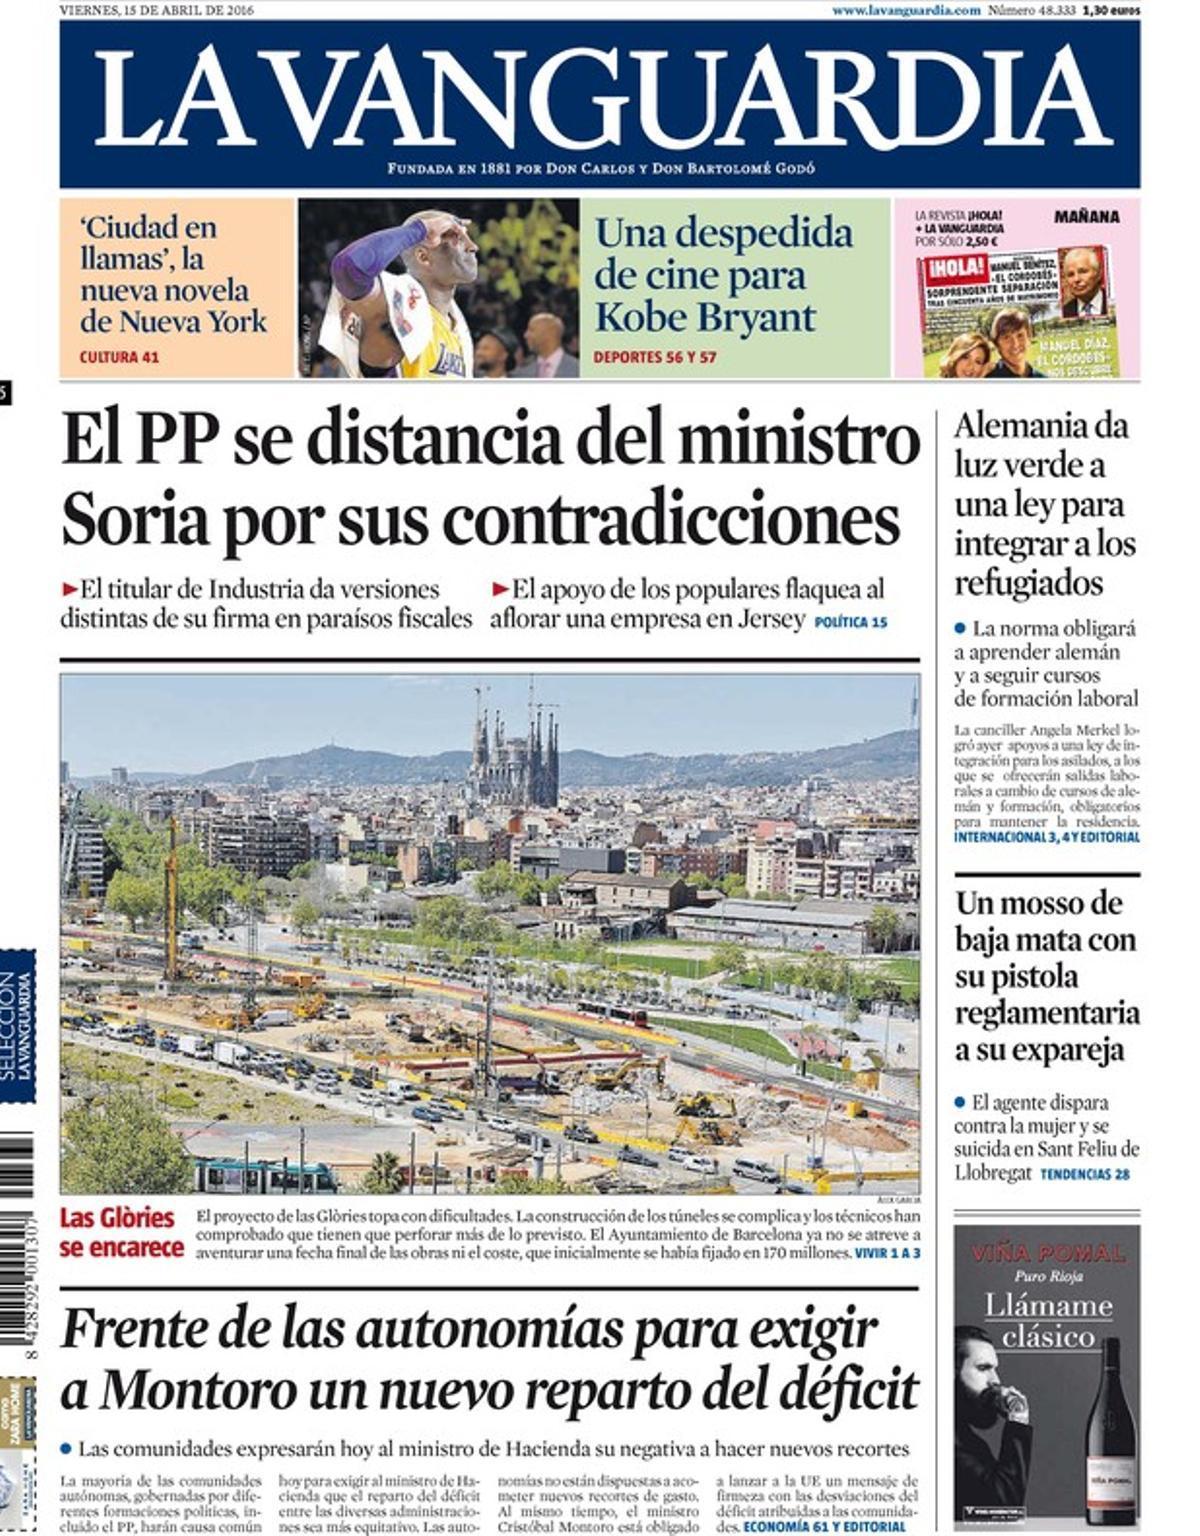 Rajoy deja caer a Soria; Marhuenda ya tiene placa de poli